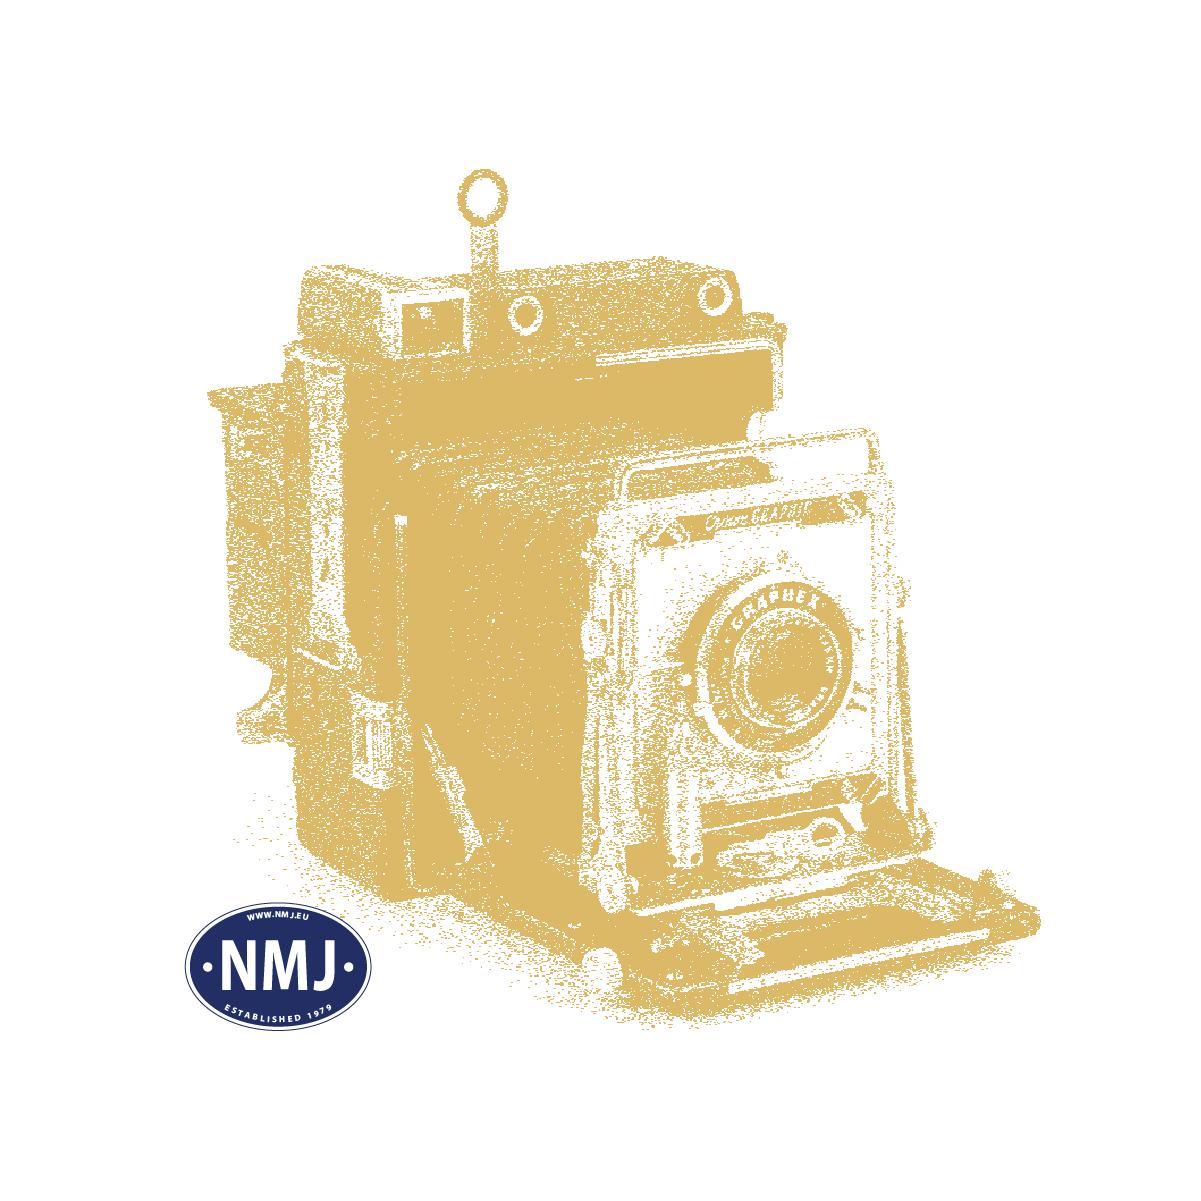 NMJT90205 - NMJ Topline MAV M61.019, DCC m/ Lyd